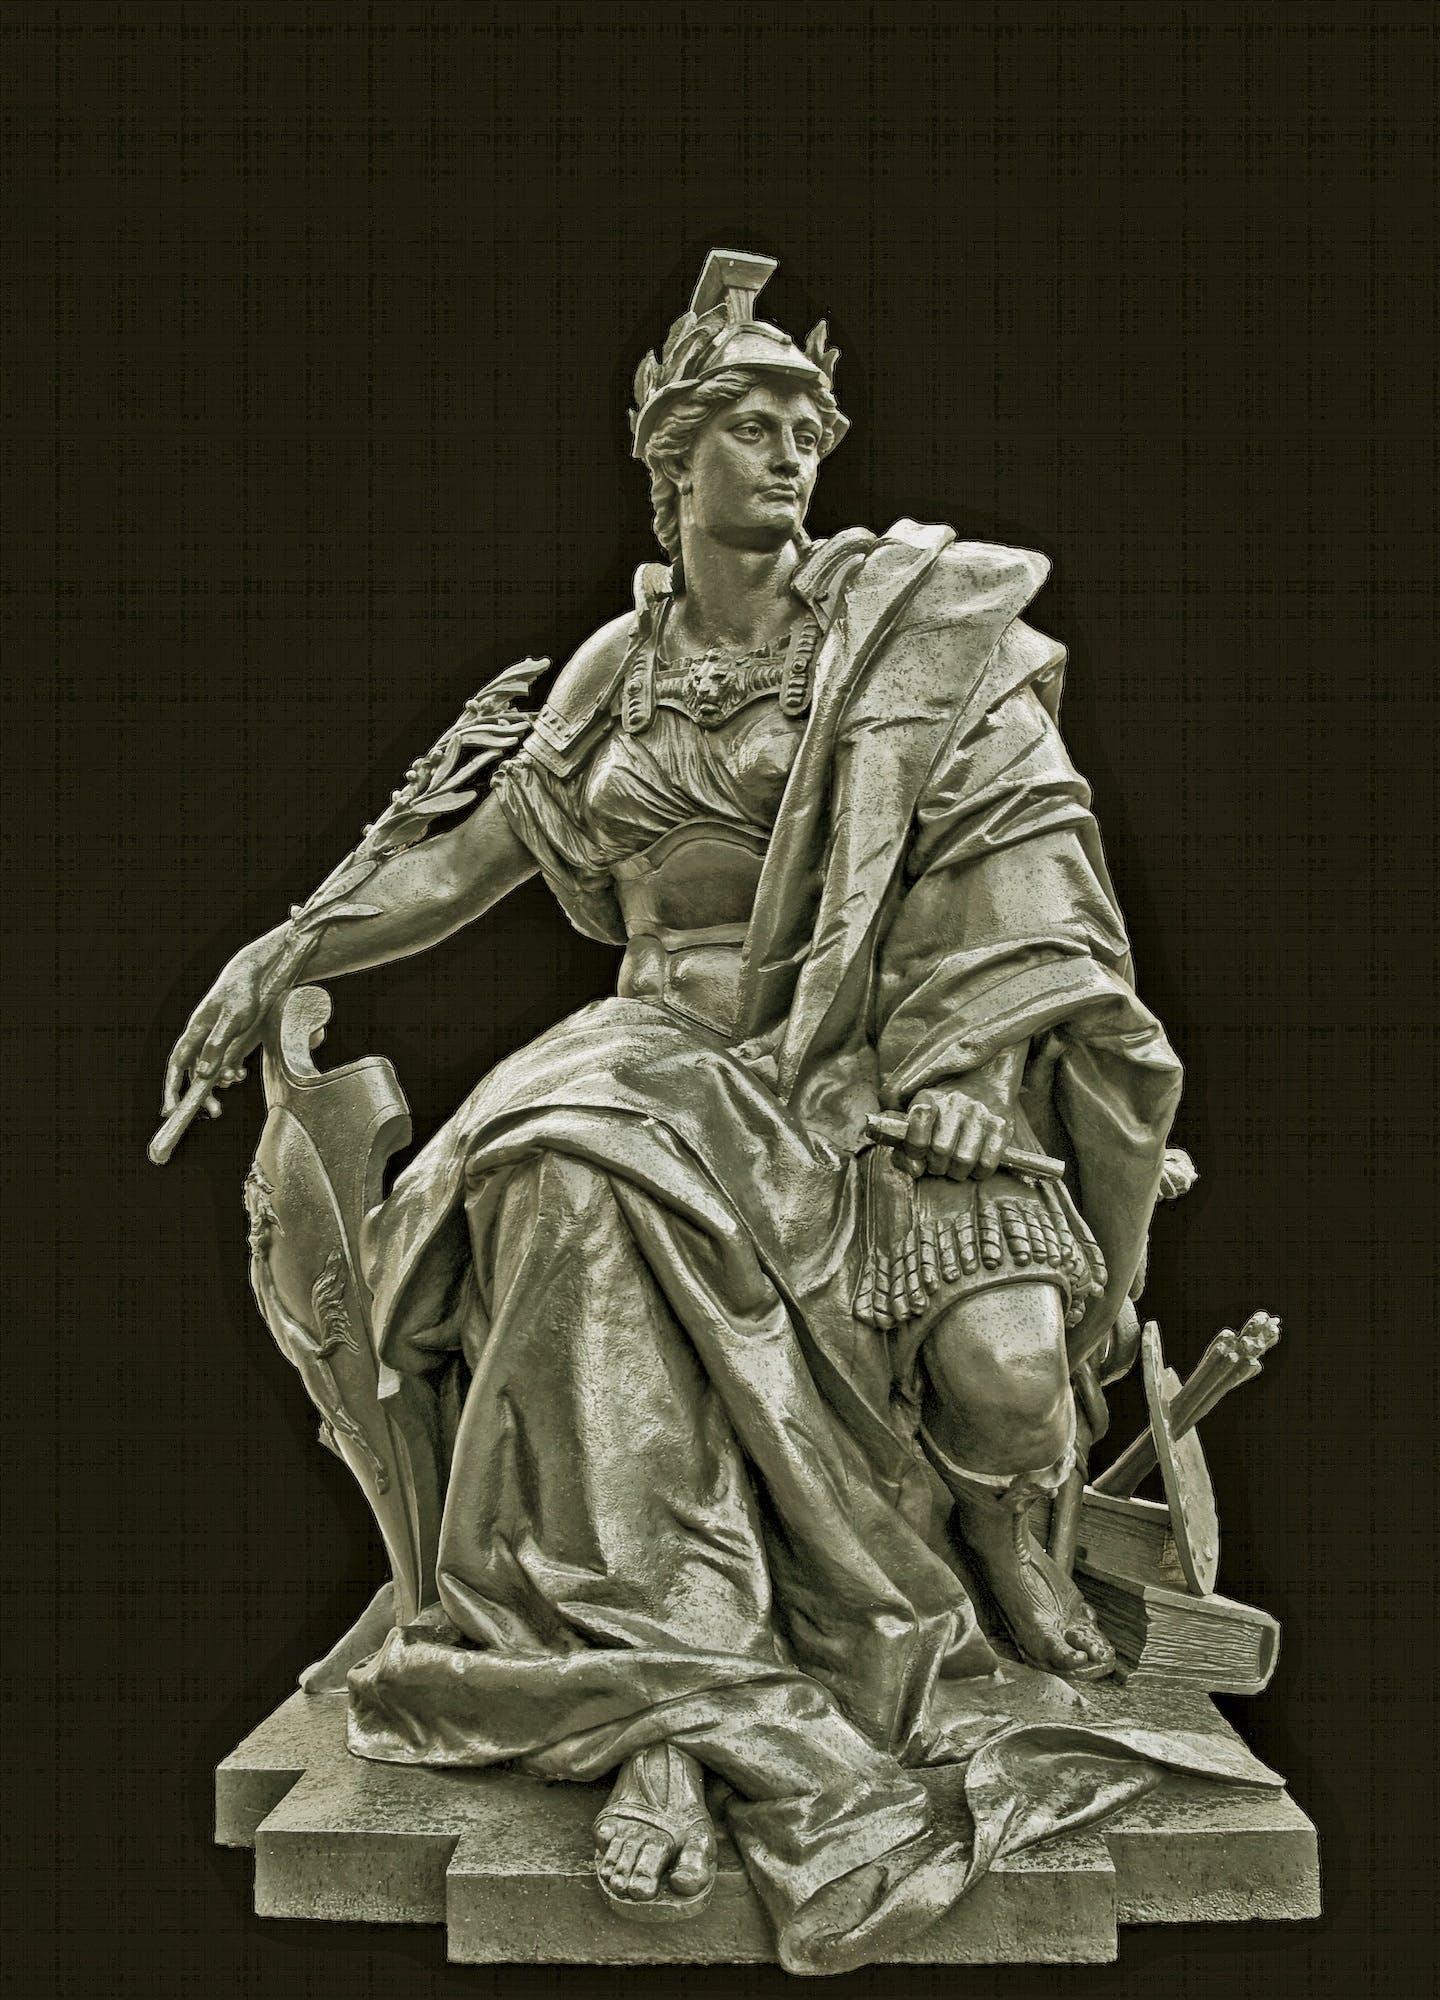 Gray Stone Sitting Man Statue